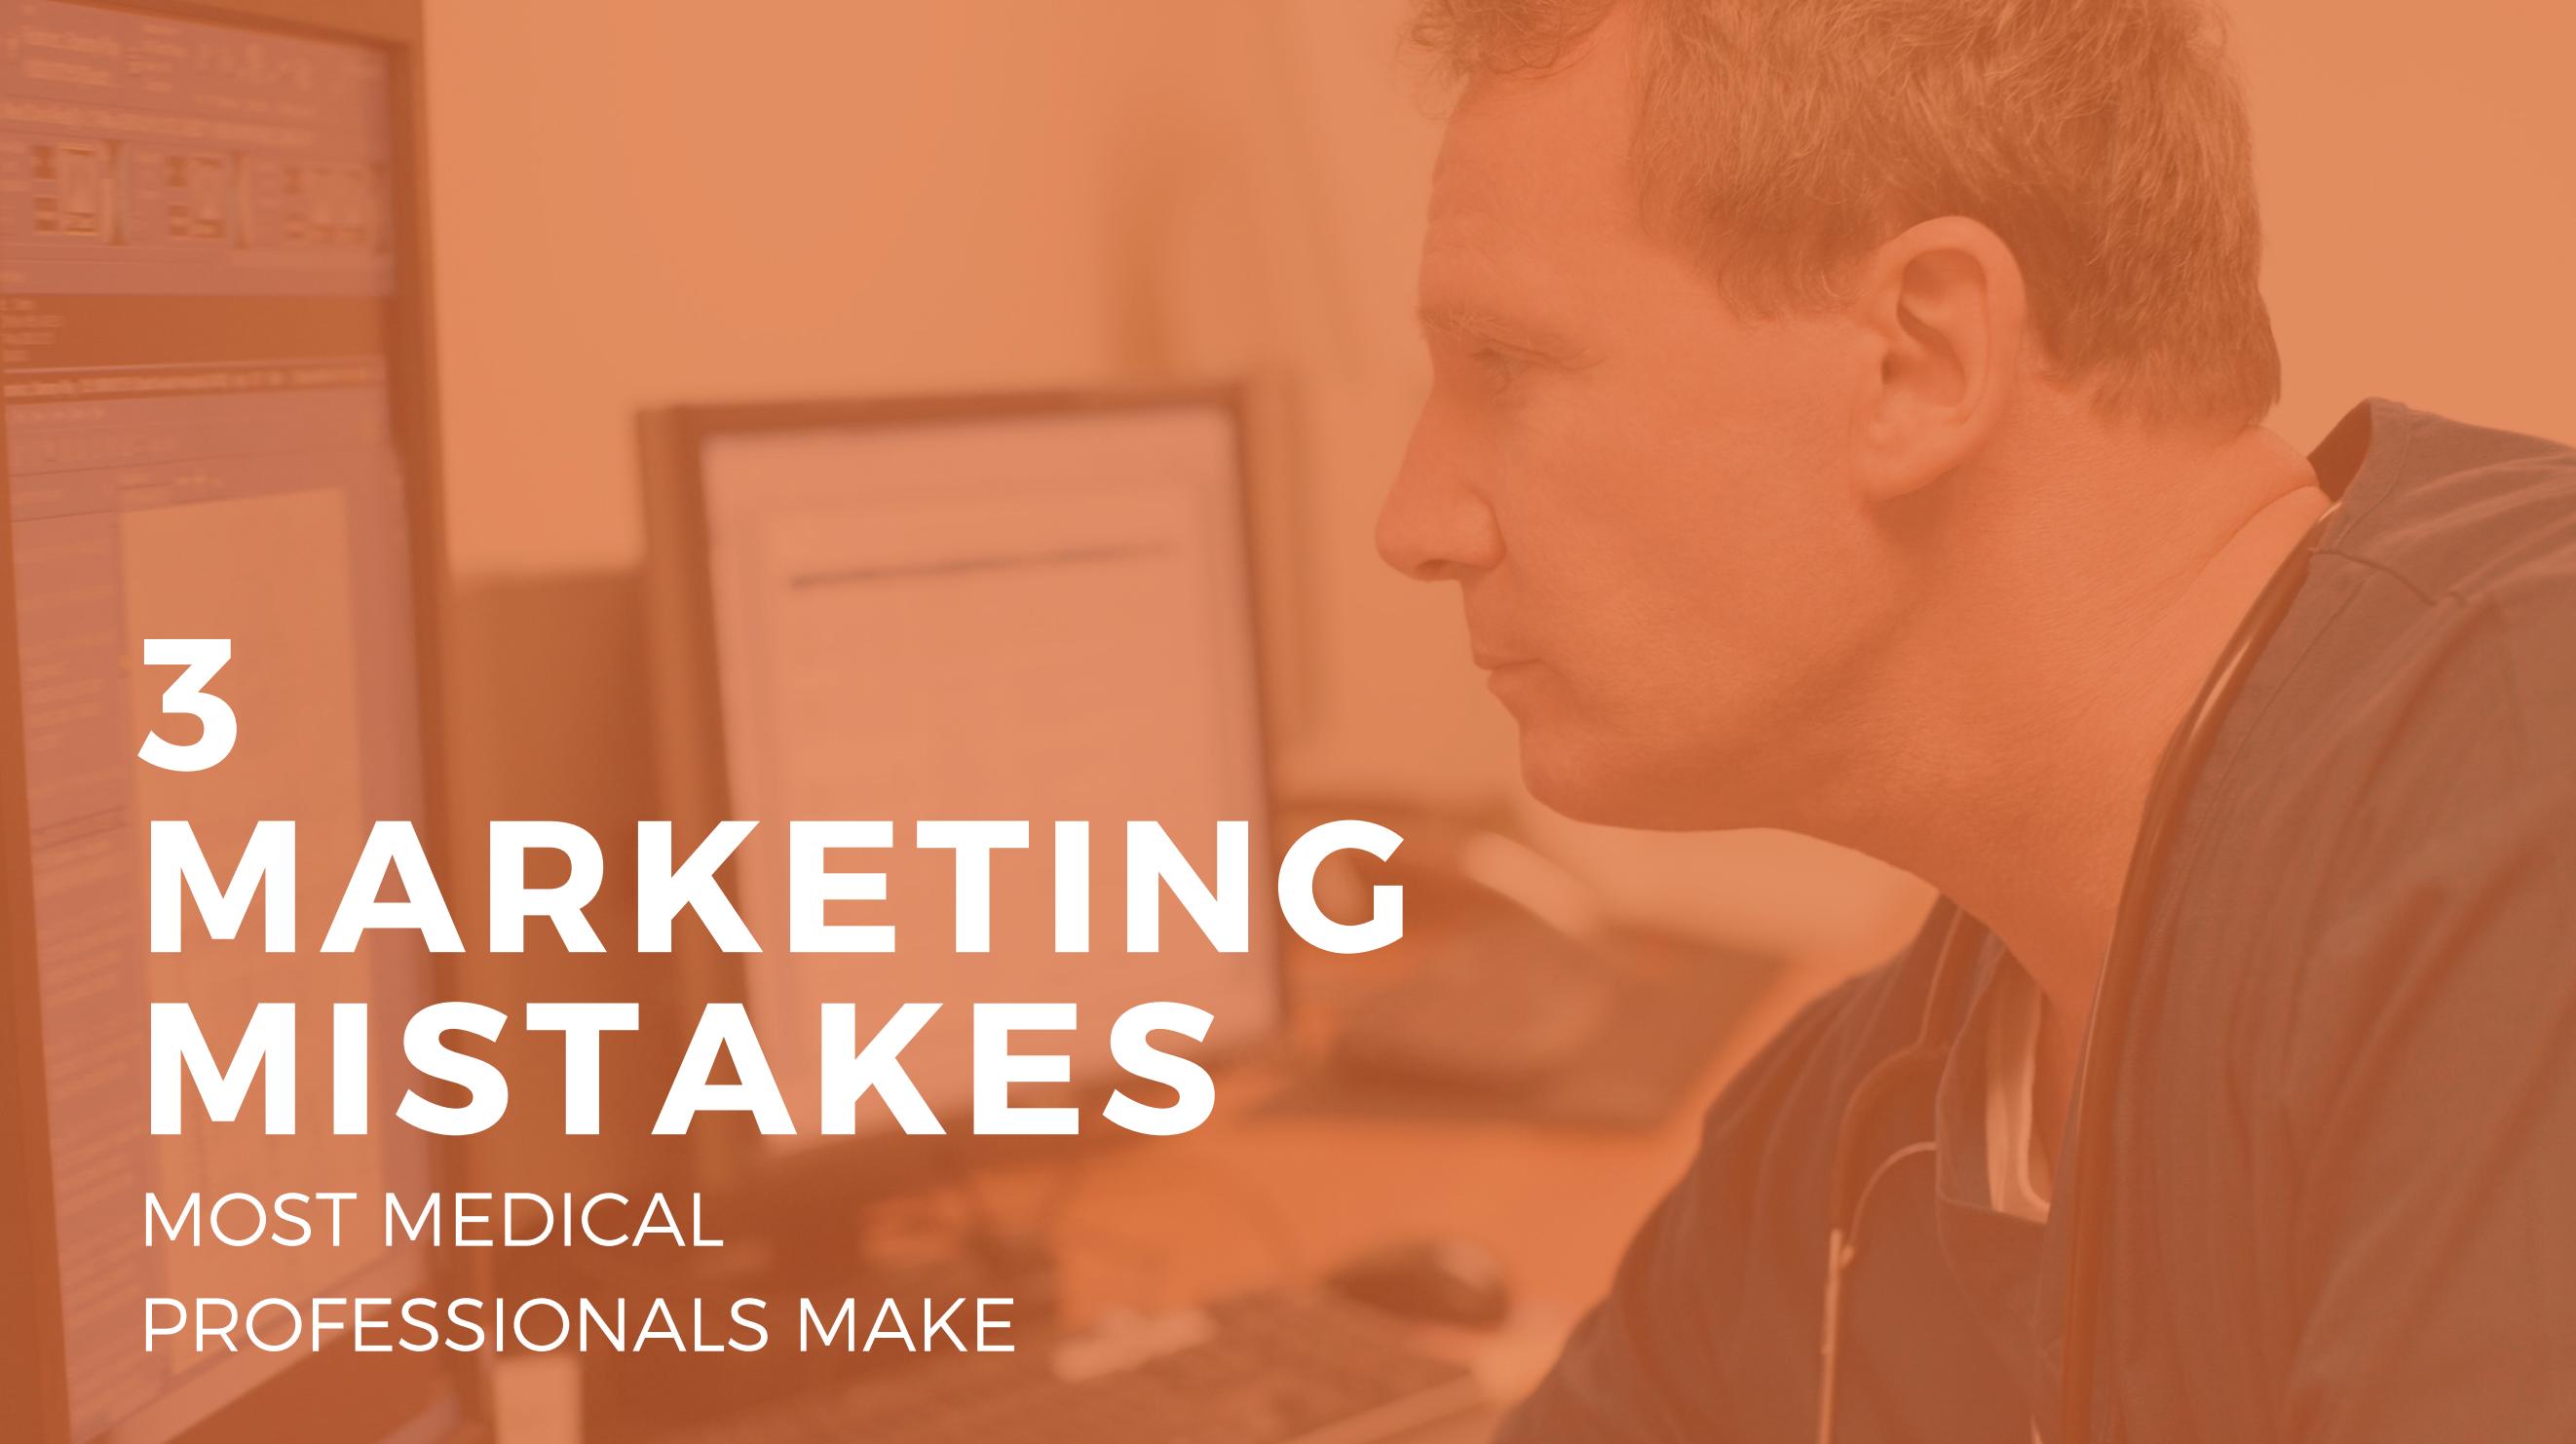 3 Marketing Mistakes